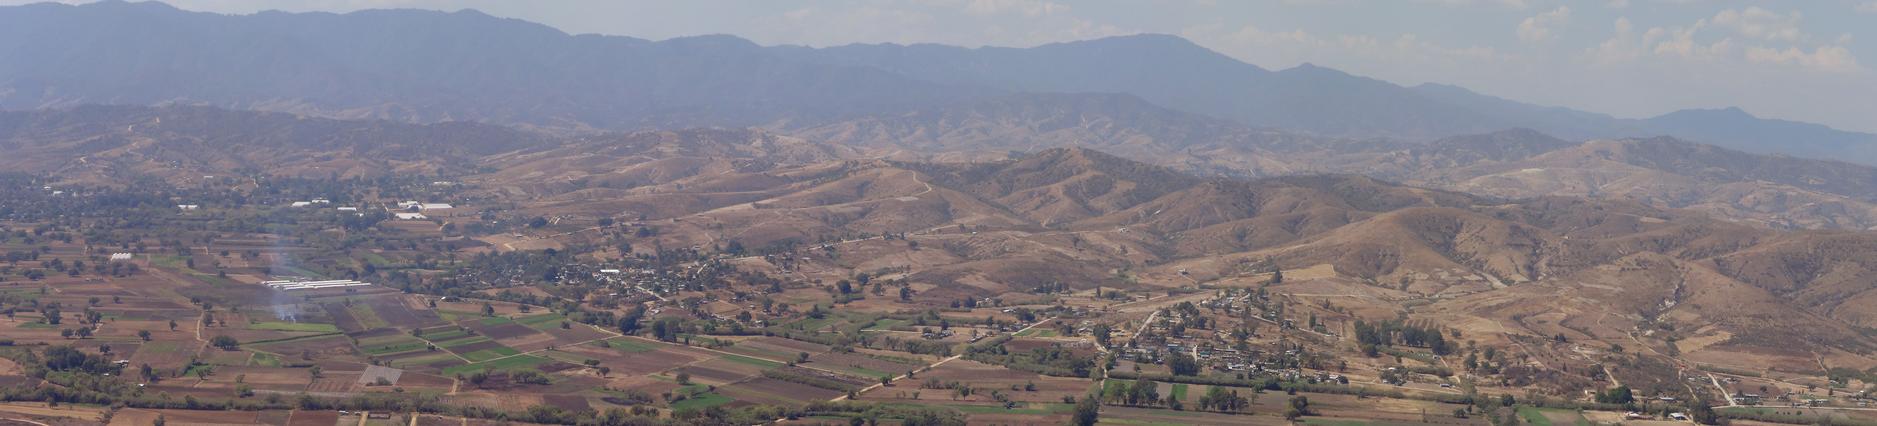 Oaxaca Mexico View Panorama 02 by ALCHEMlST